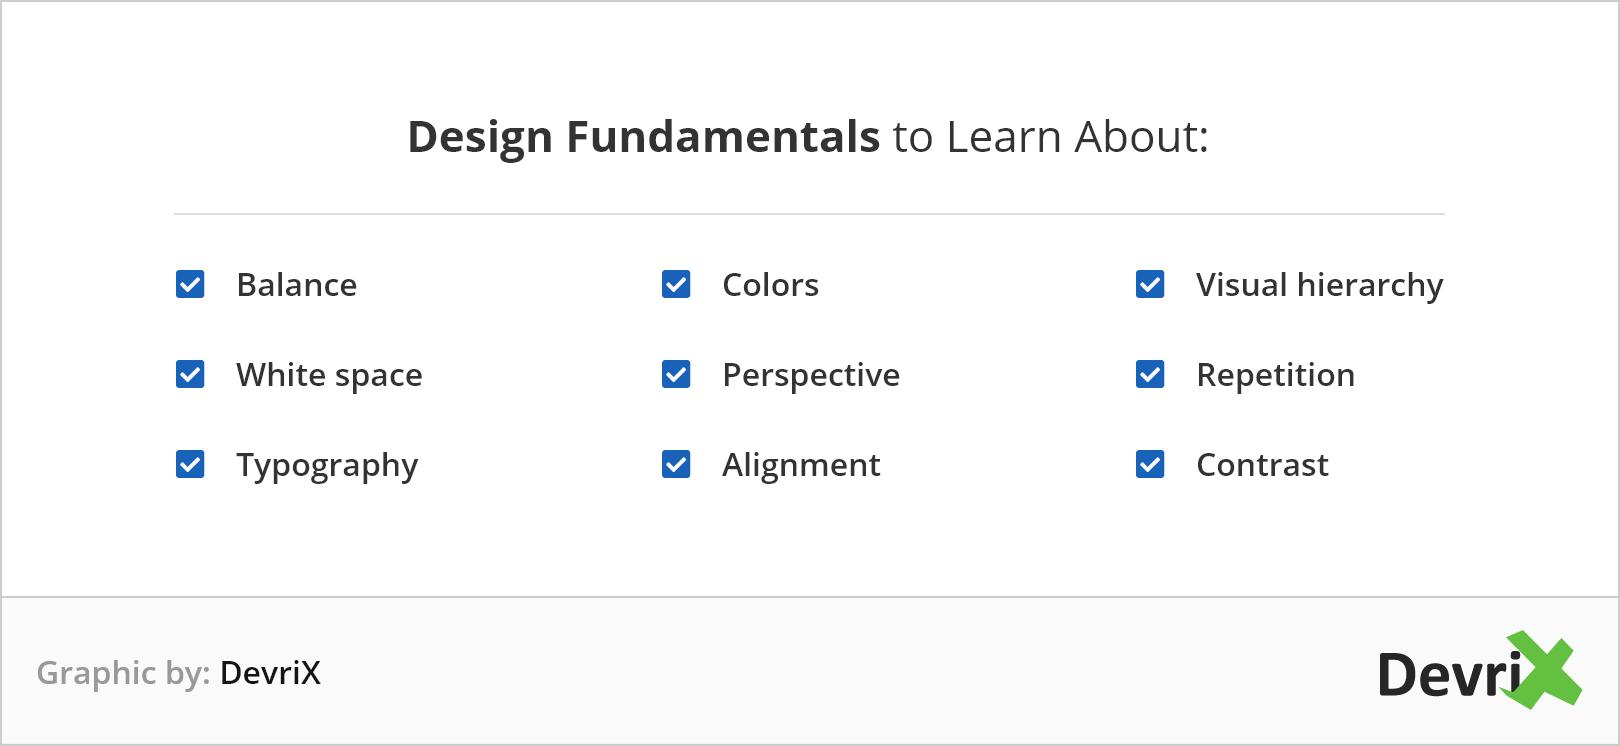 design fundamentals to learn